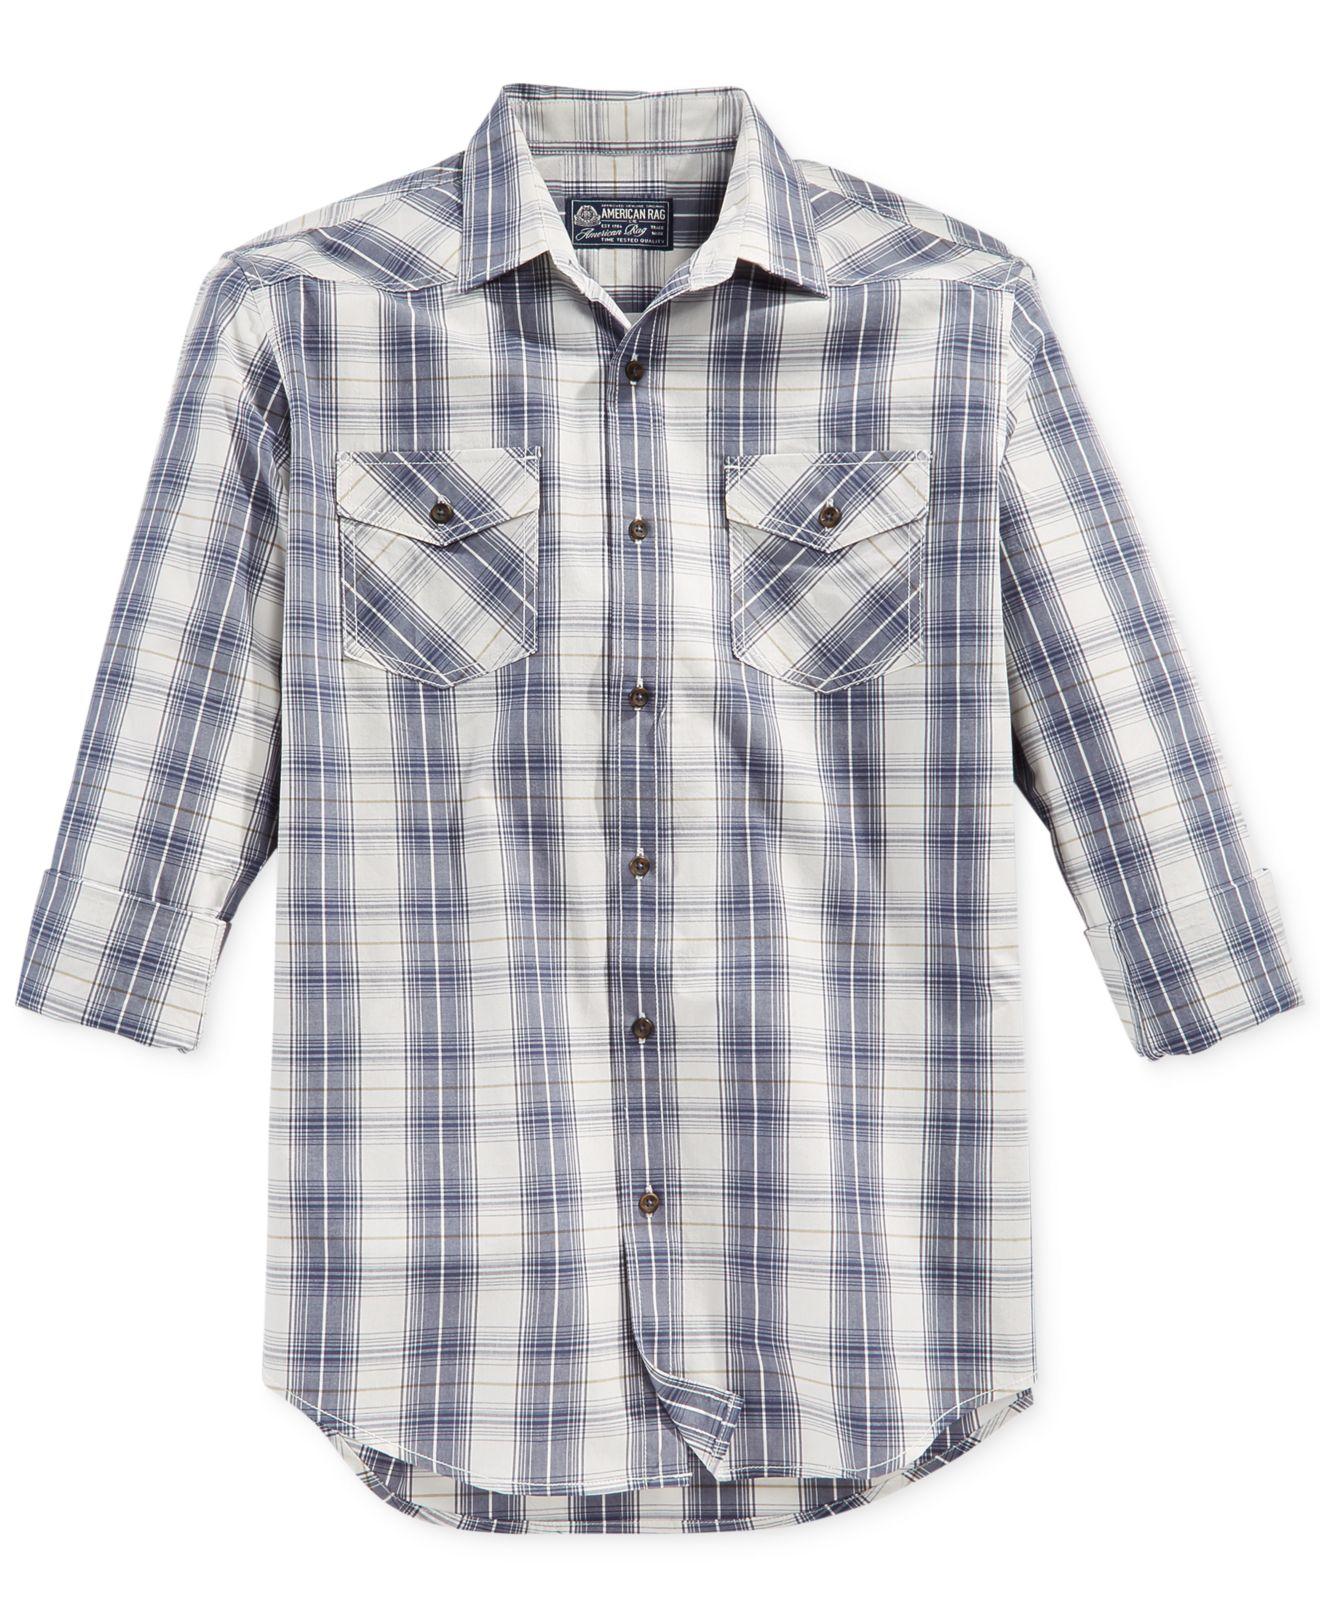 american rag berlin plaid shirt in gray for lyst